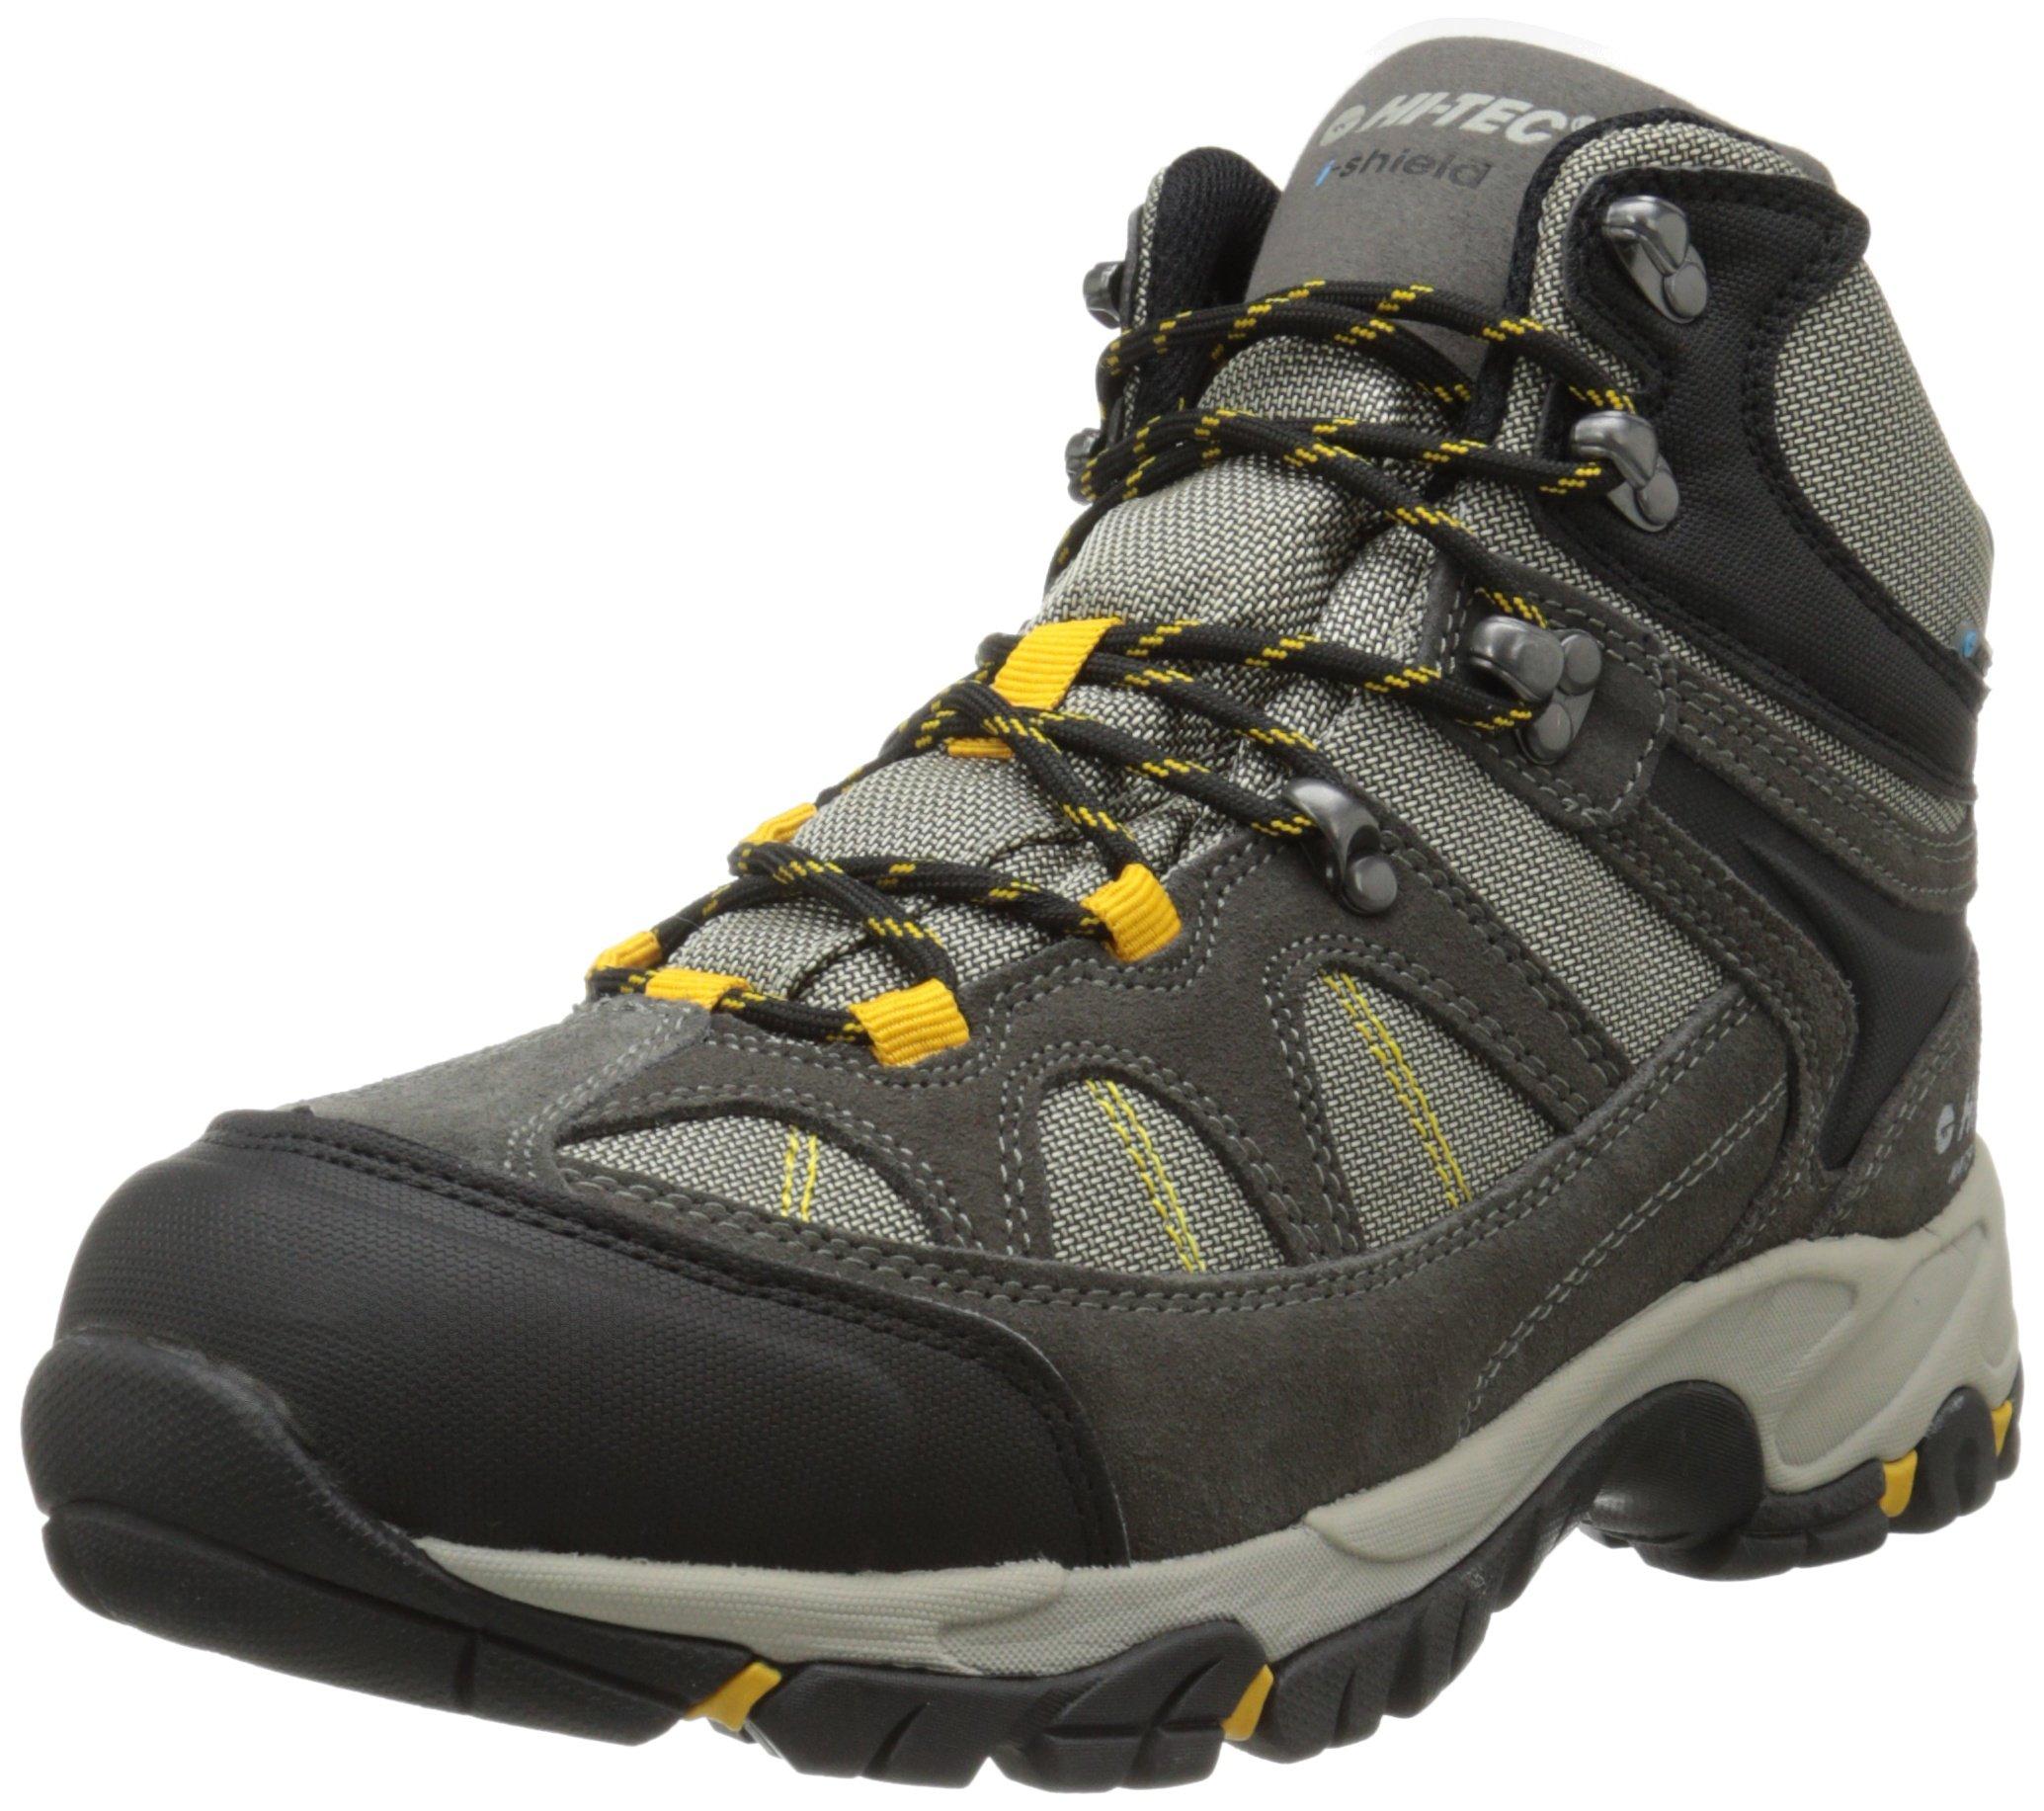 Hi-Tec Men's Altitude Lite I Waterproof Hiking Boot, Charcoal/Warm Grey/Gold,7.5 M US